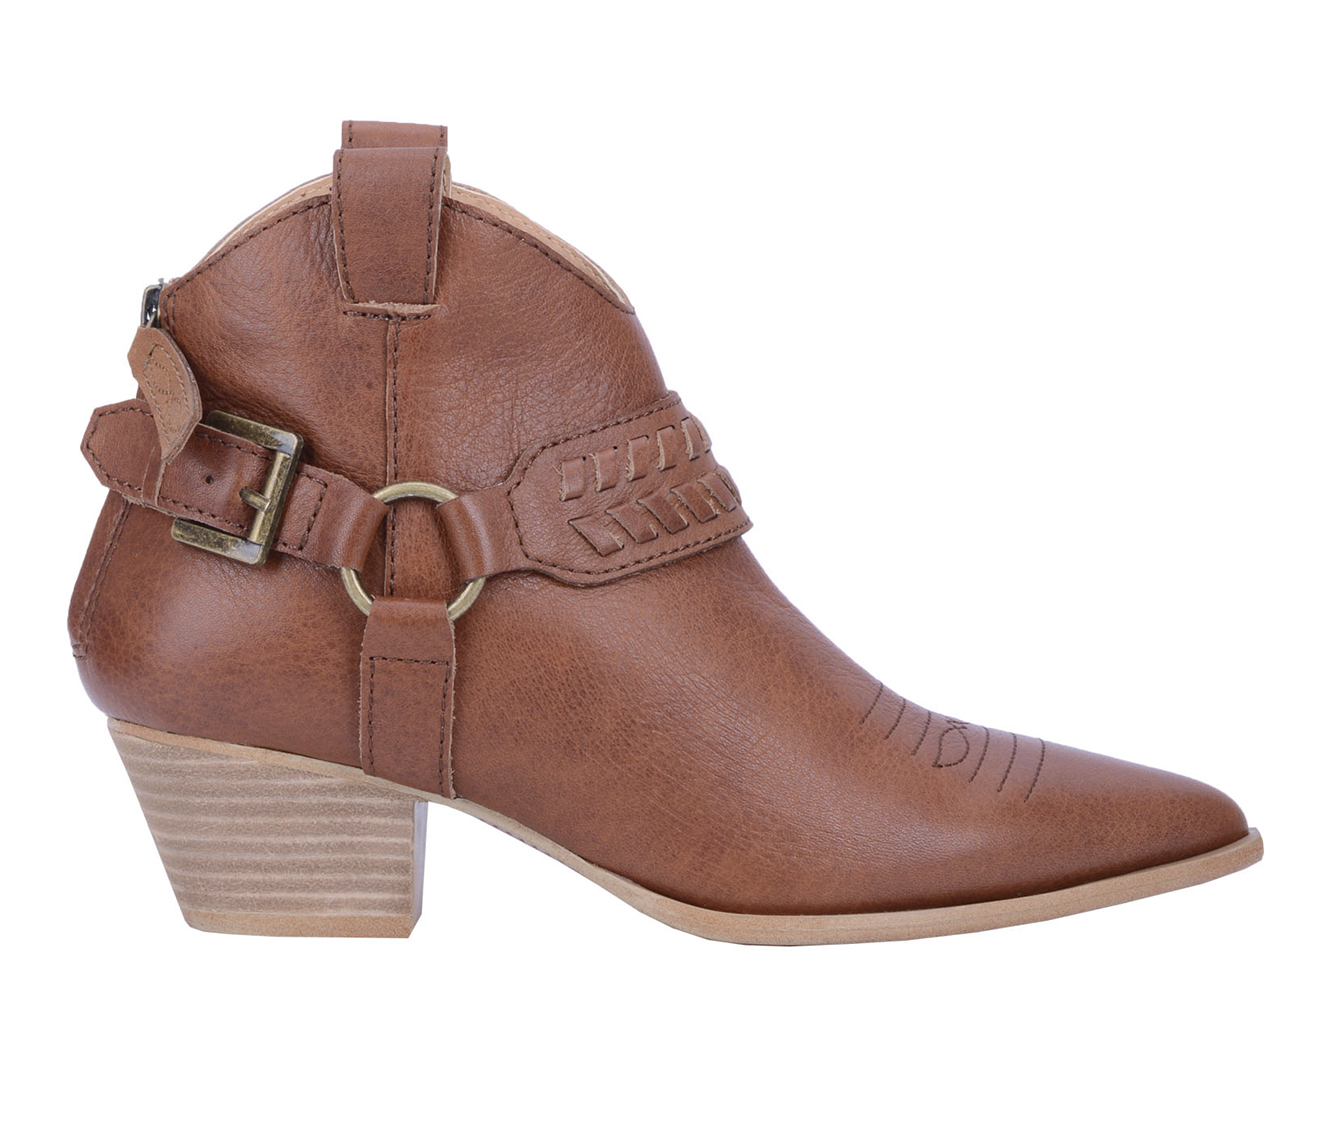 Dingo Boots Keepsake Women's Boots (Brown - Leather)